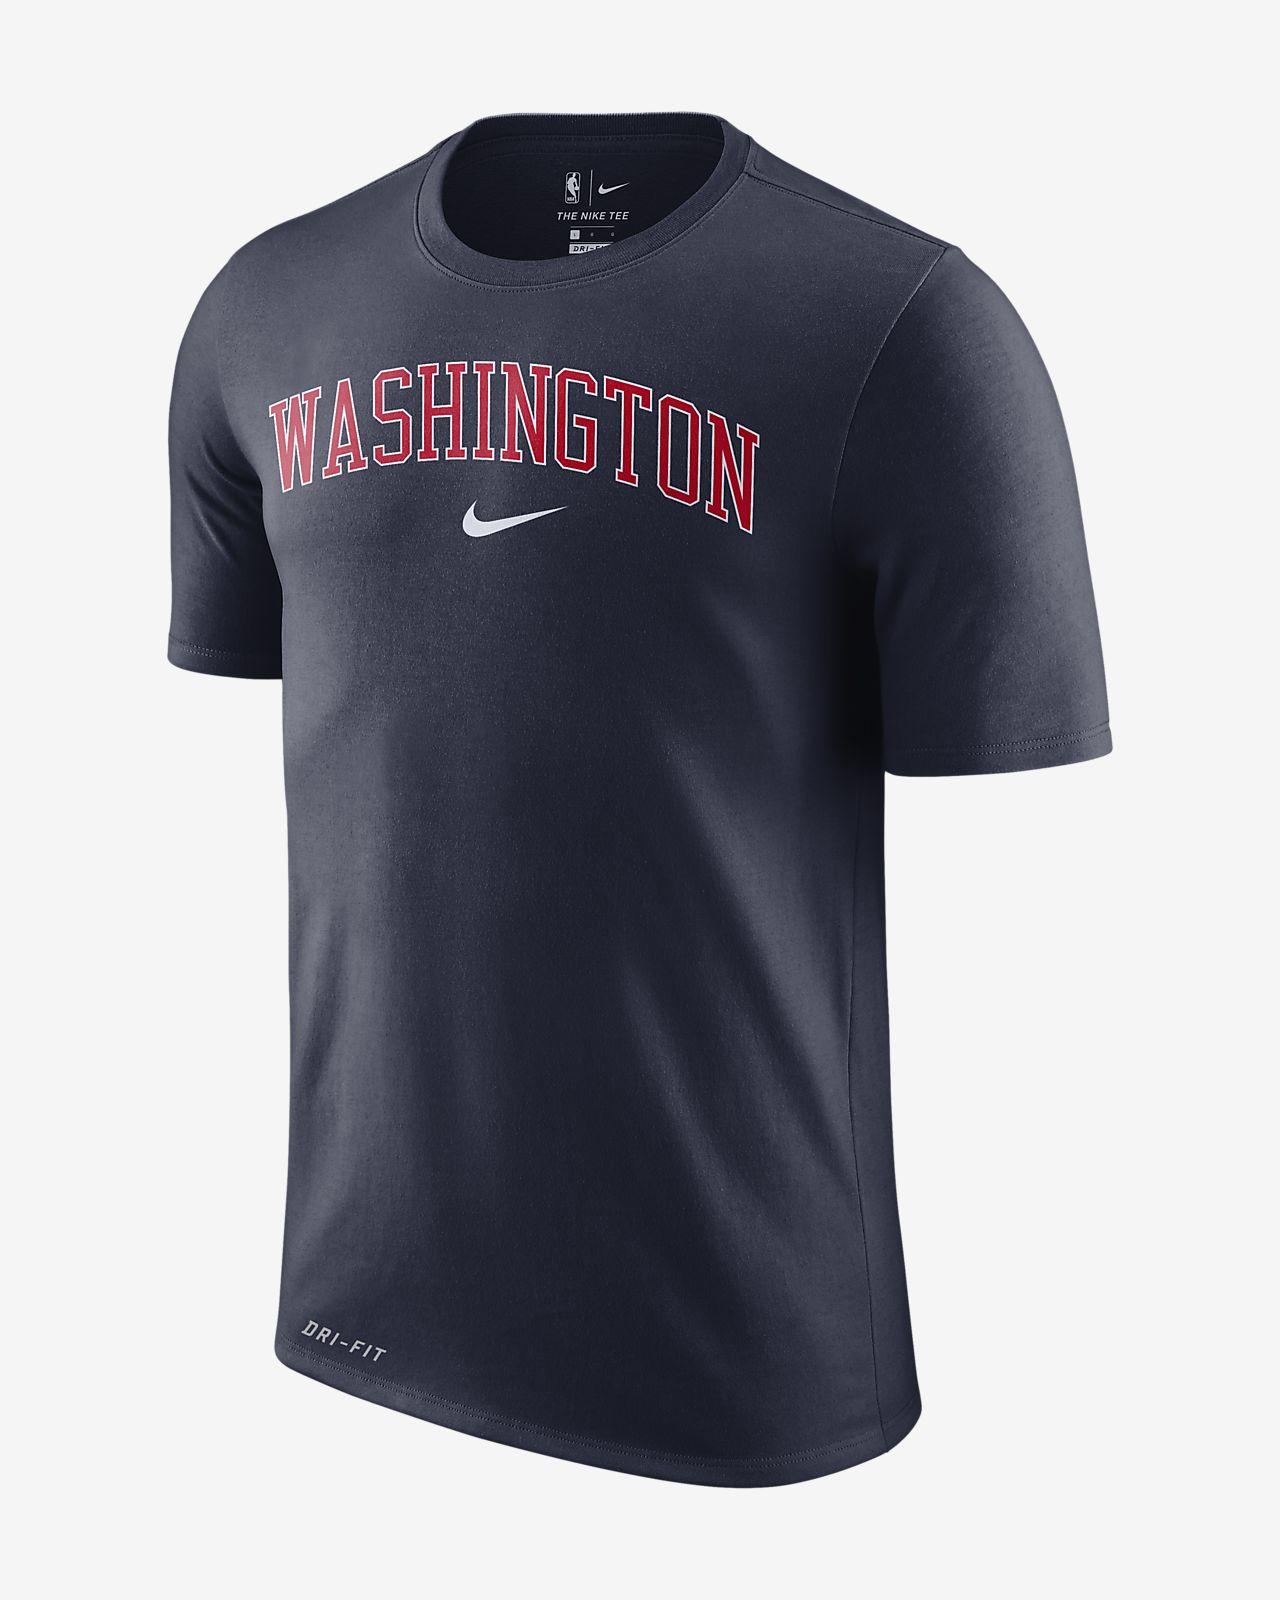 Washington Wizards Nike Dri-FIT Men's NBA T-Shirt